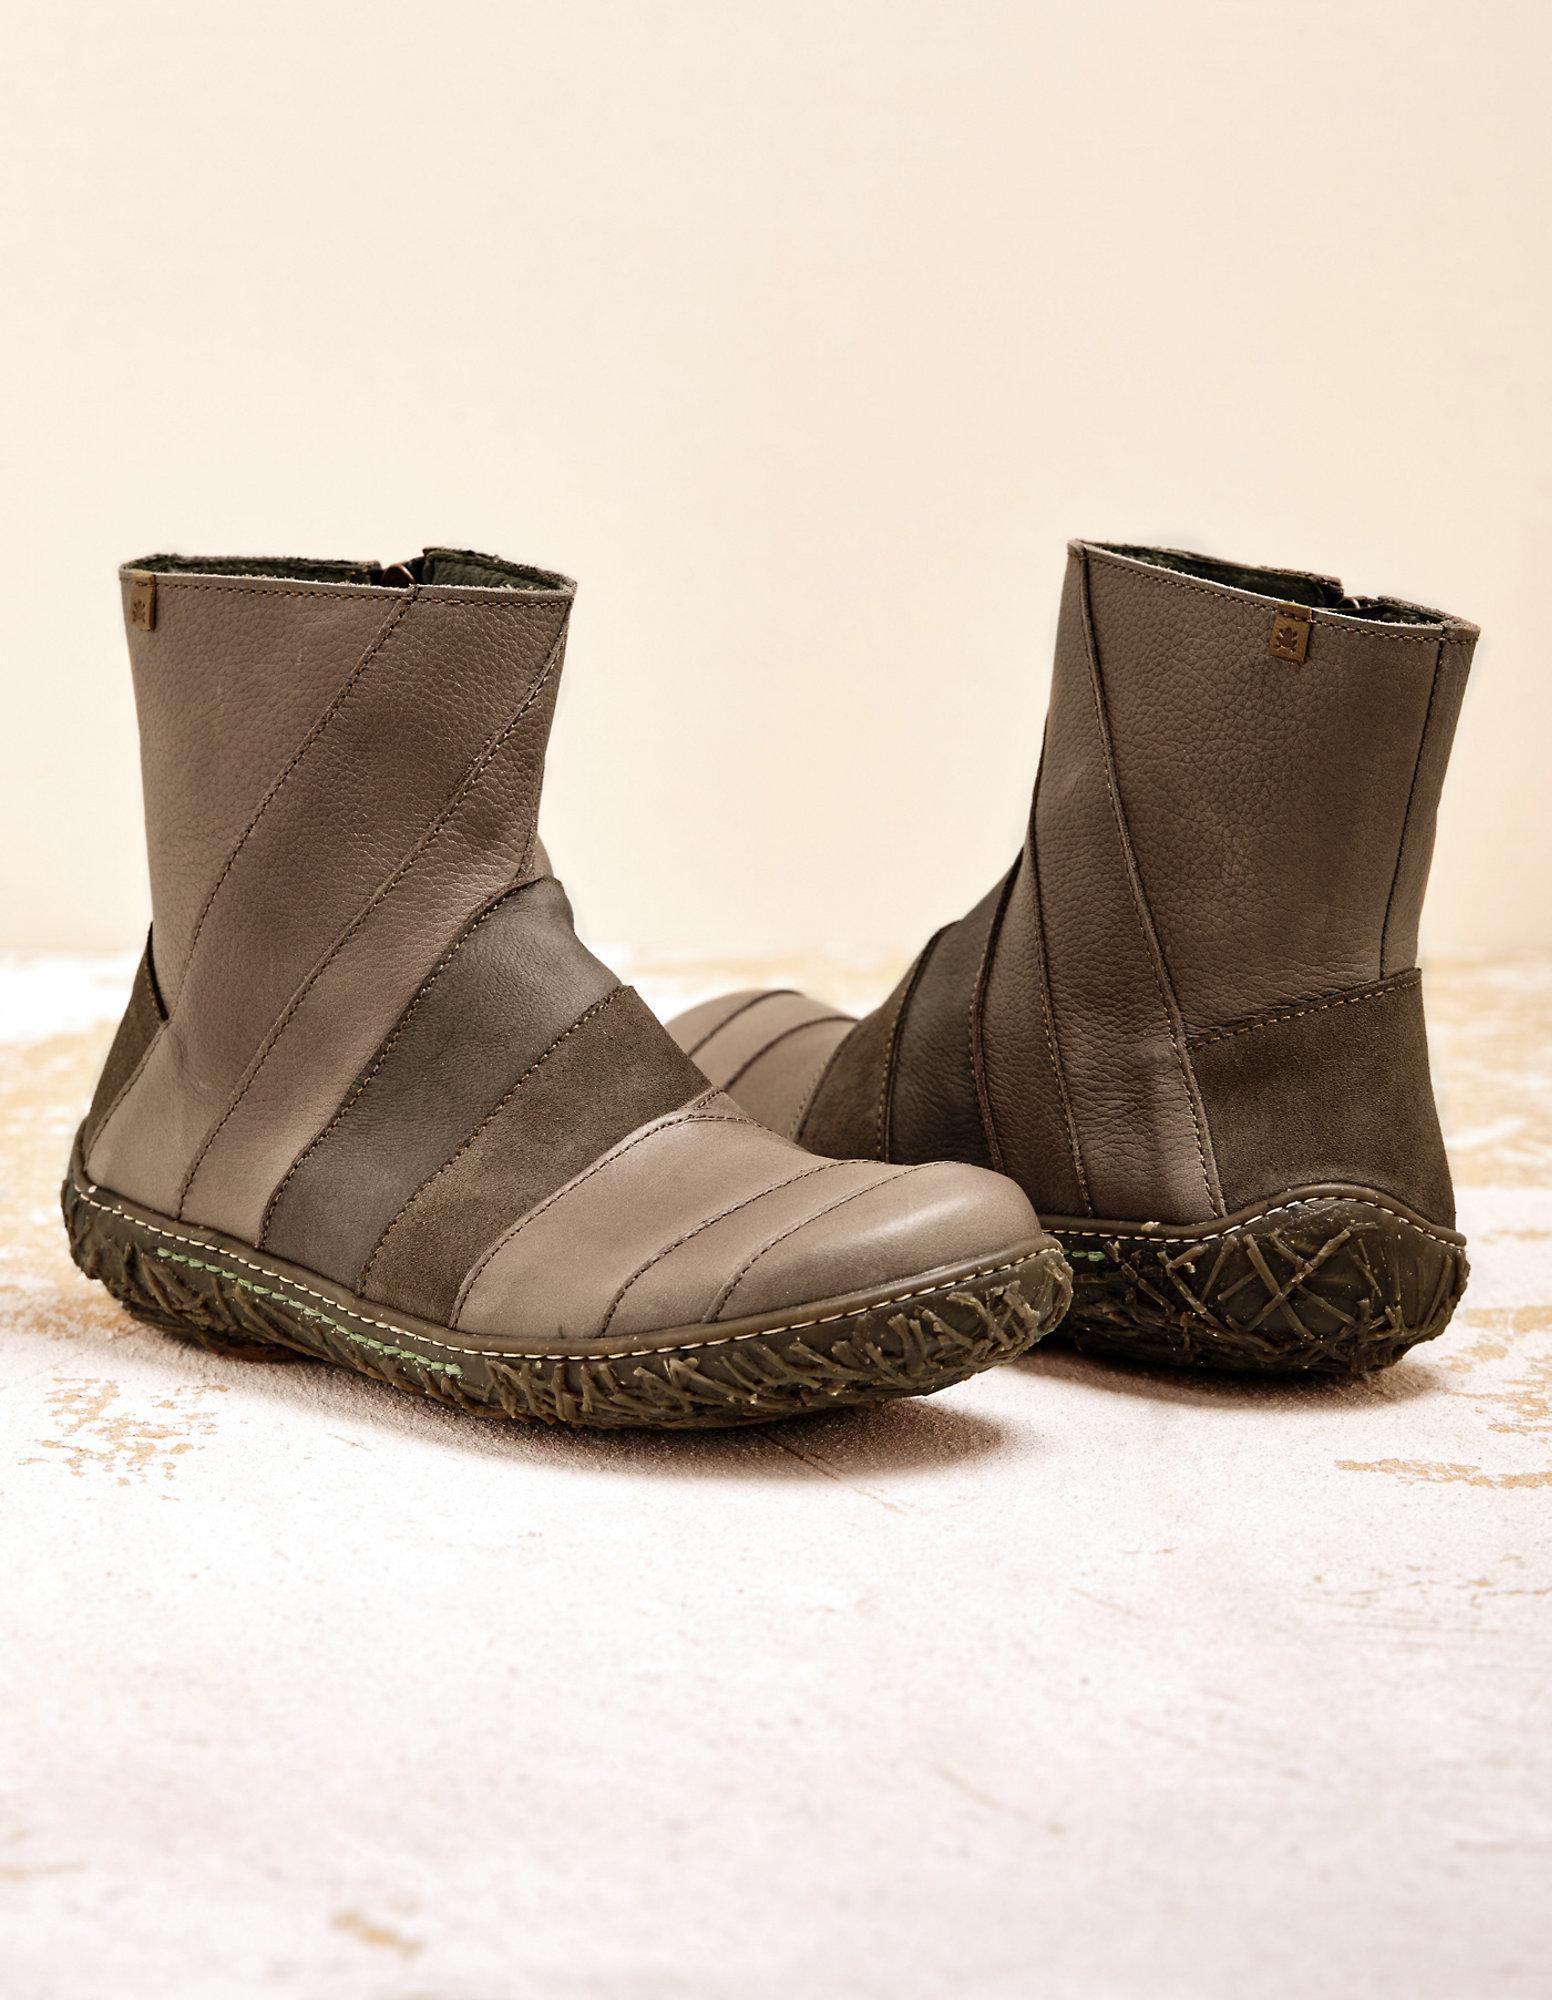 Rieker Damen Stiefel grau 93756 42 NEU Herbst